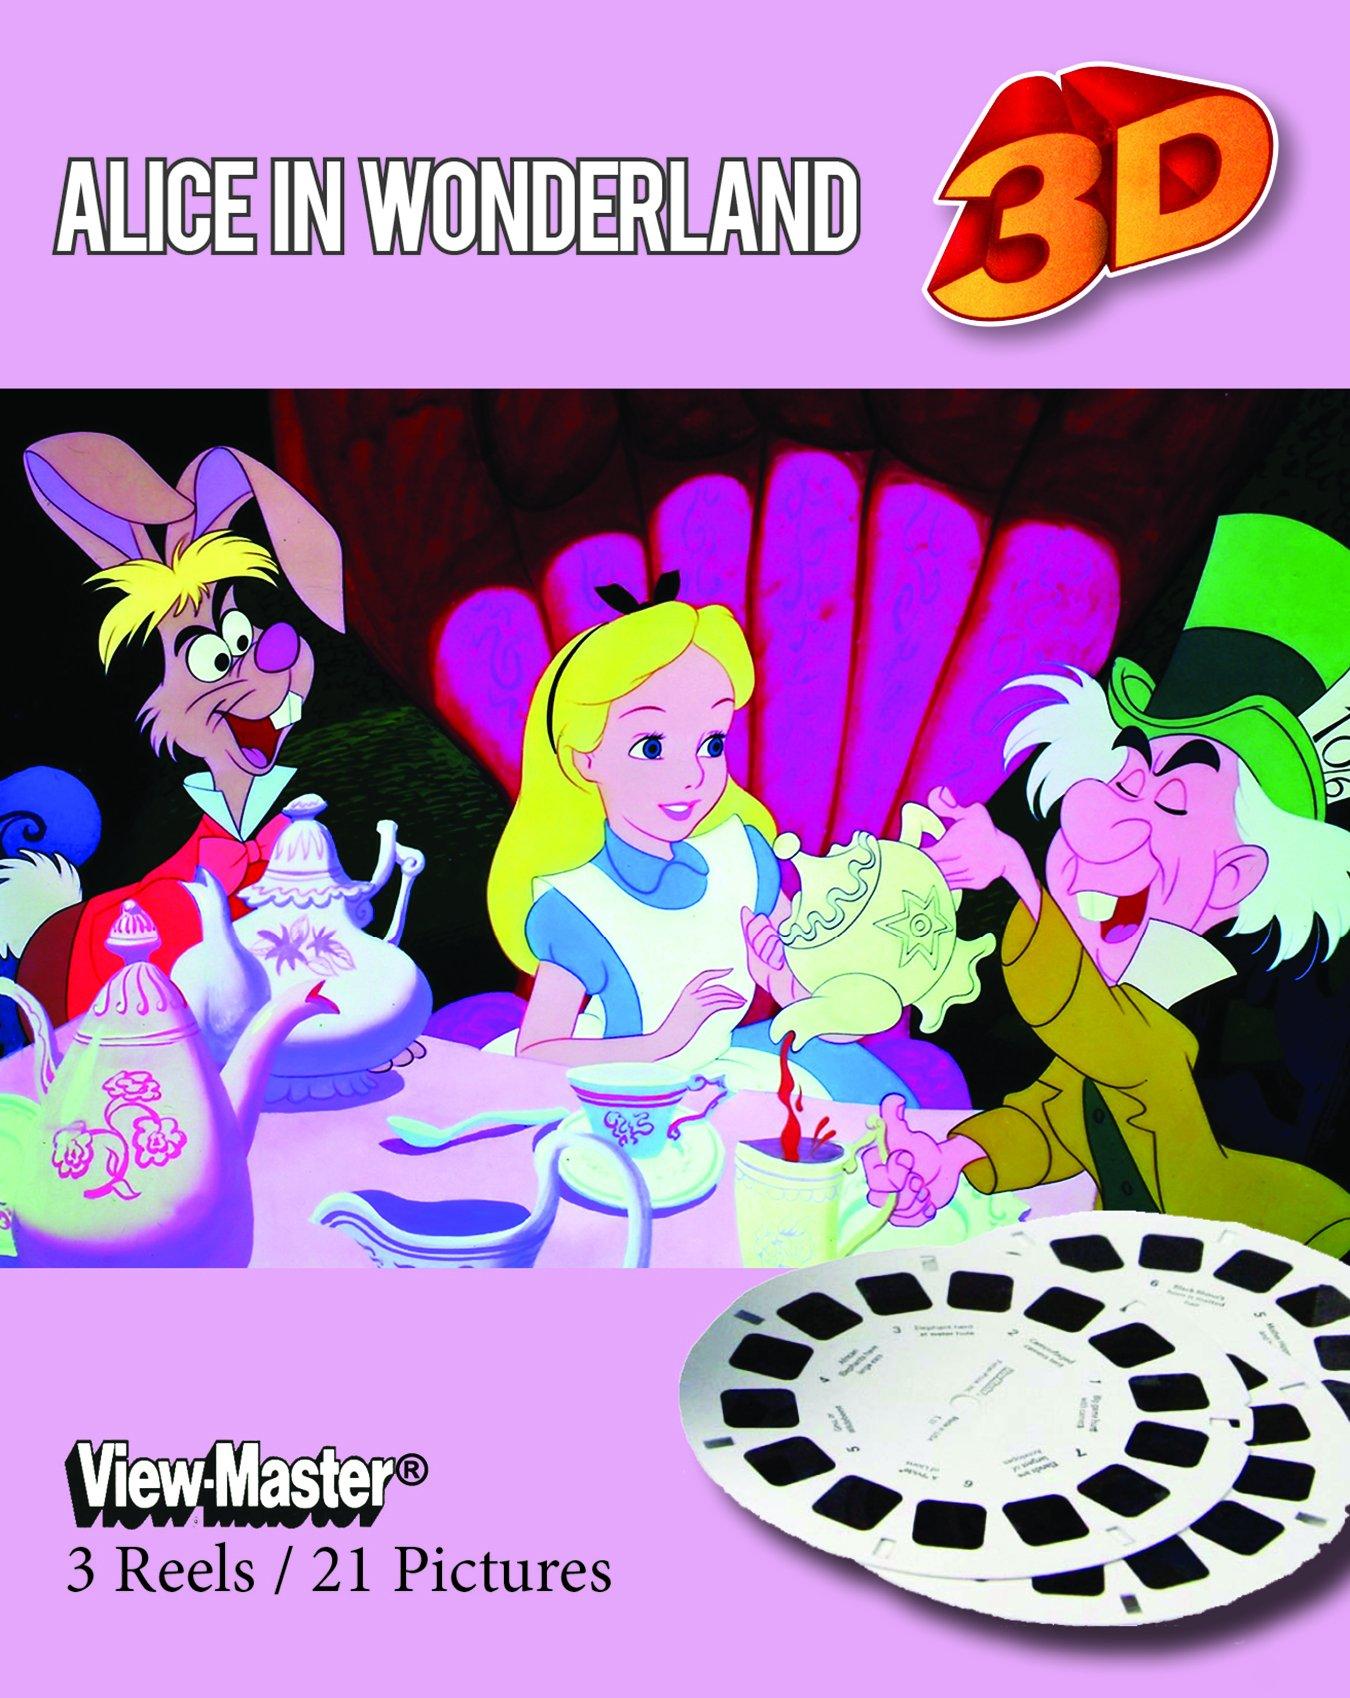 View-Master Classic 3Reel Set Alice in Wonderland